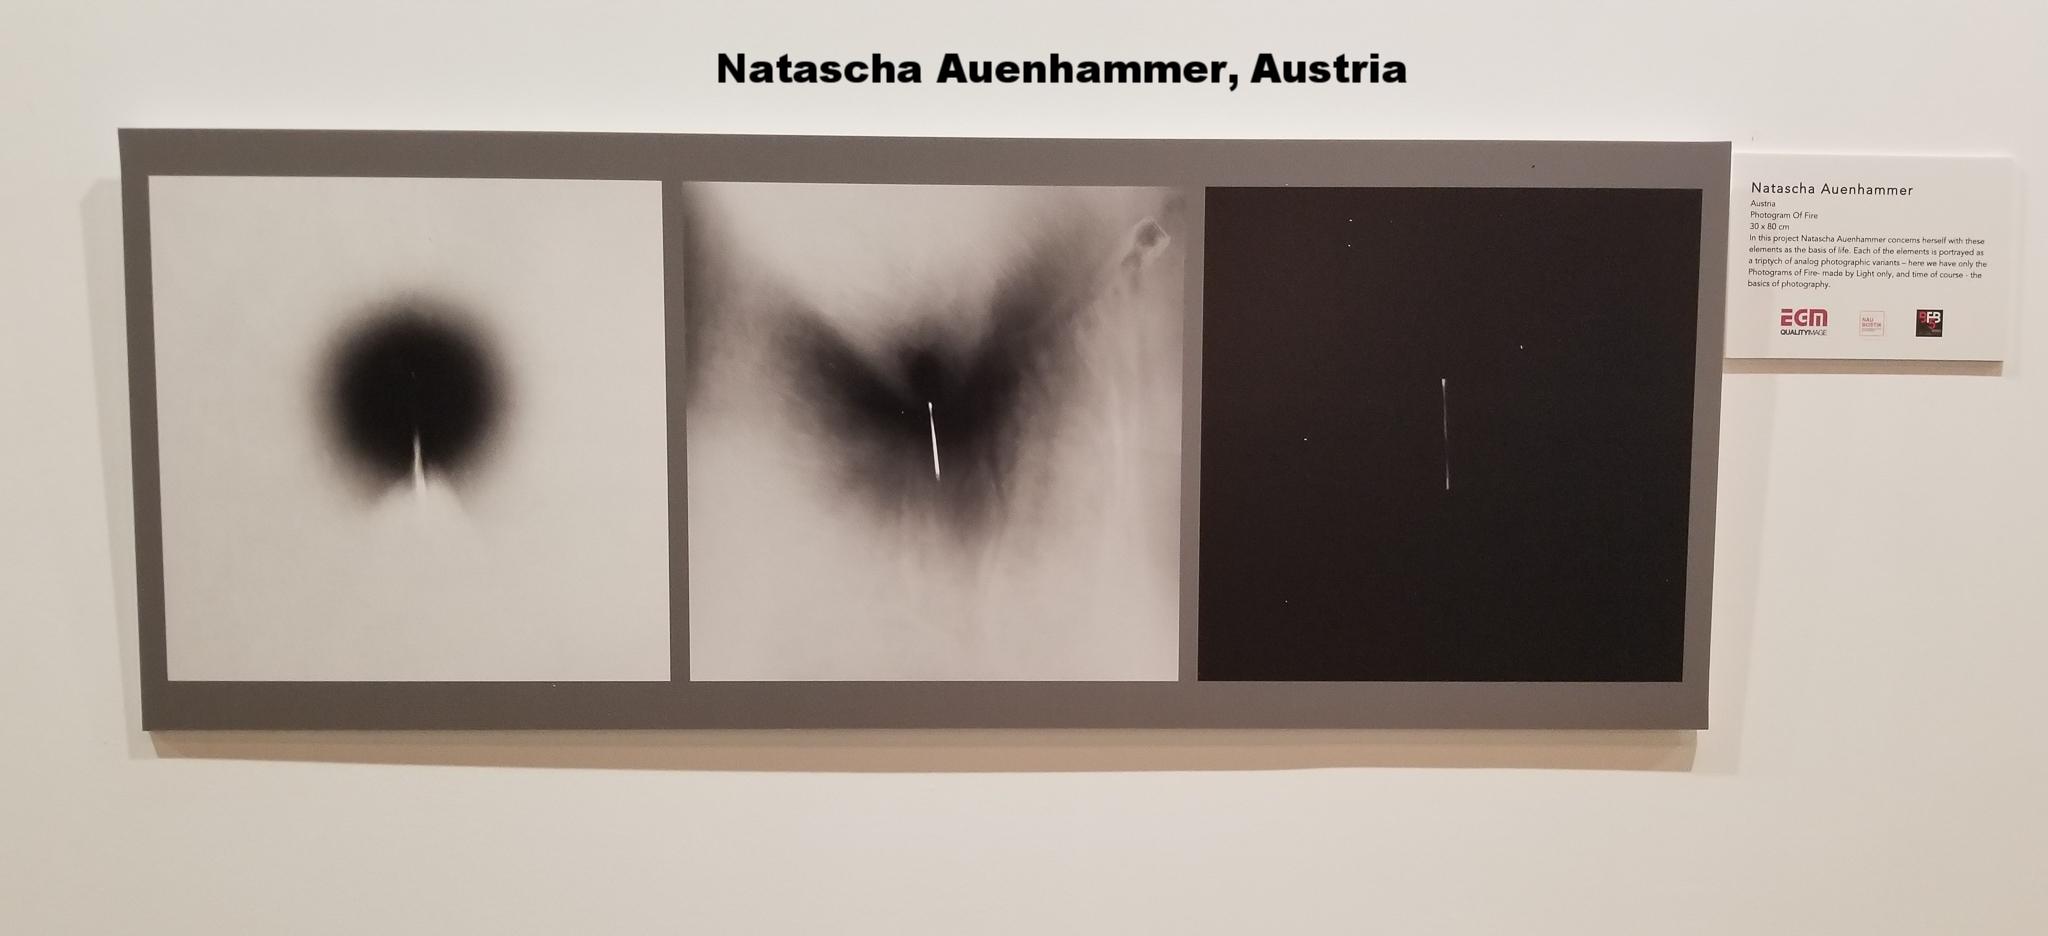 Natascha Auenhammer, Austria